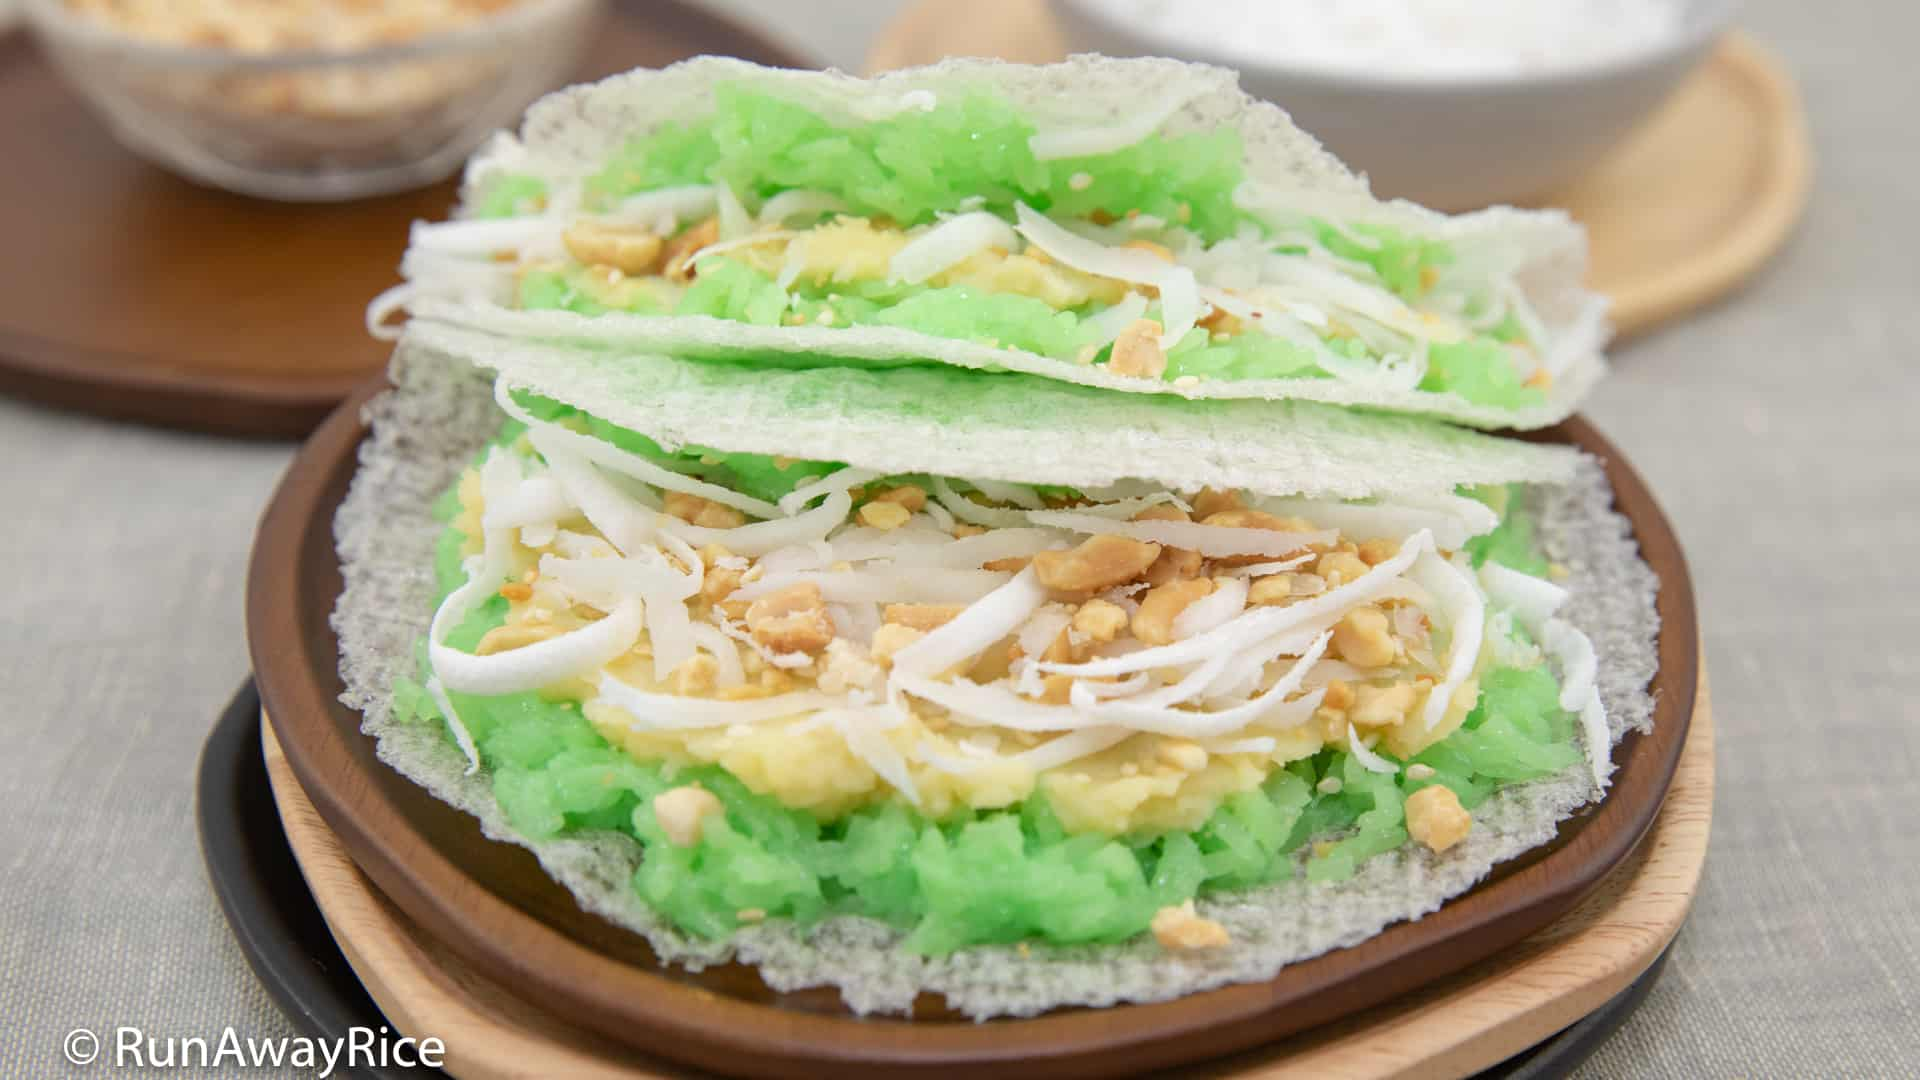 Pandan Sticky Rice with Tapioca Paper (Xoi Boc Banh Trang) - Breakfast or Snack Food! | recipe from runawayrice.com